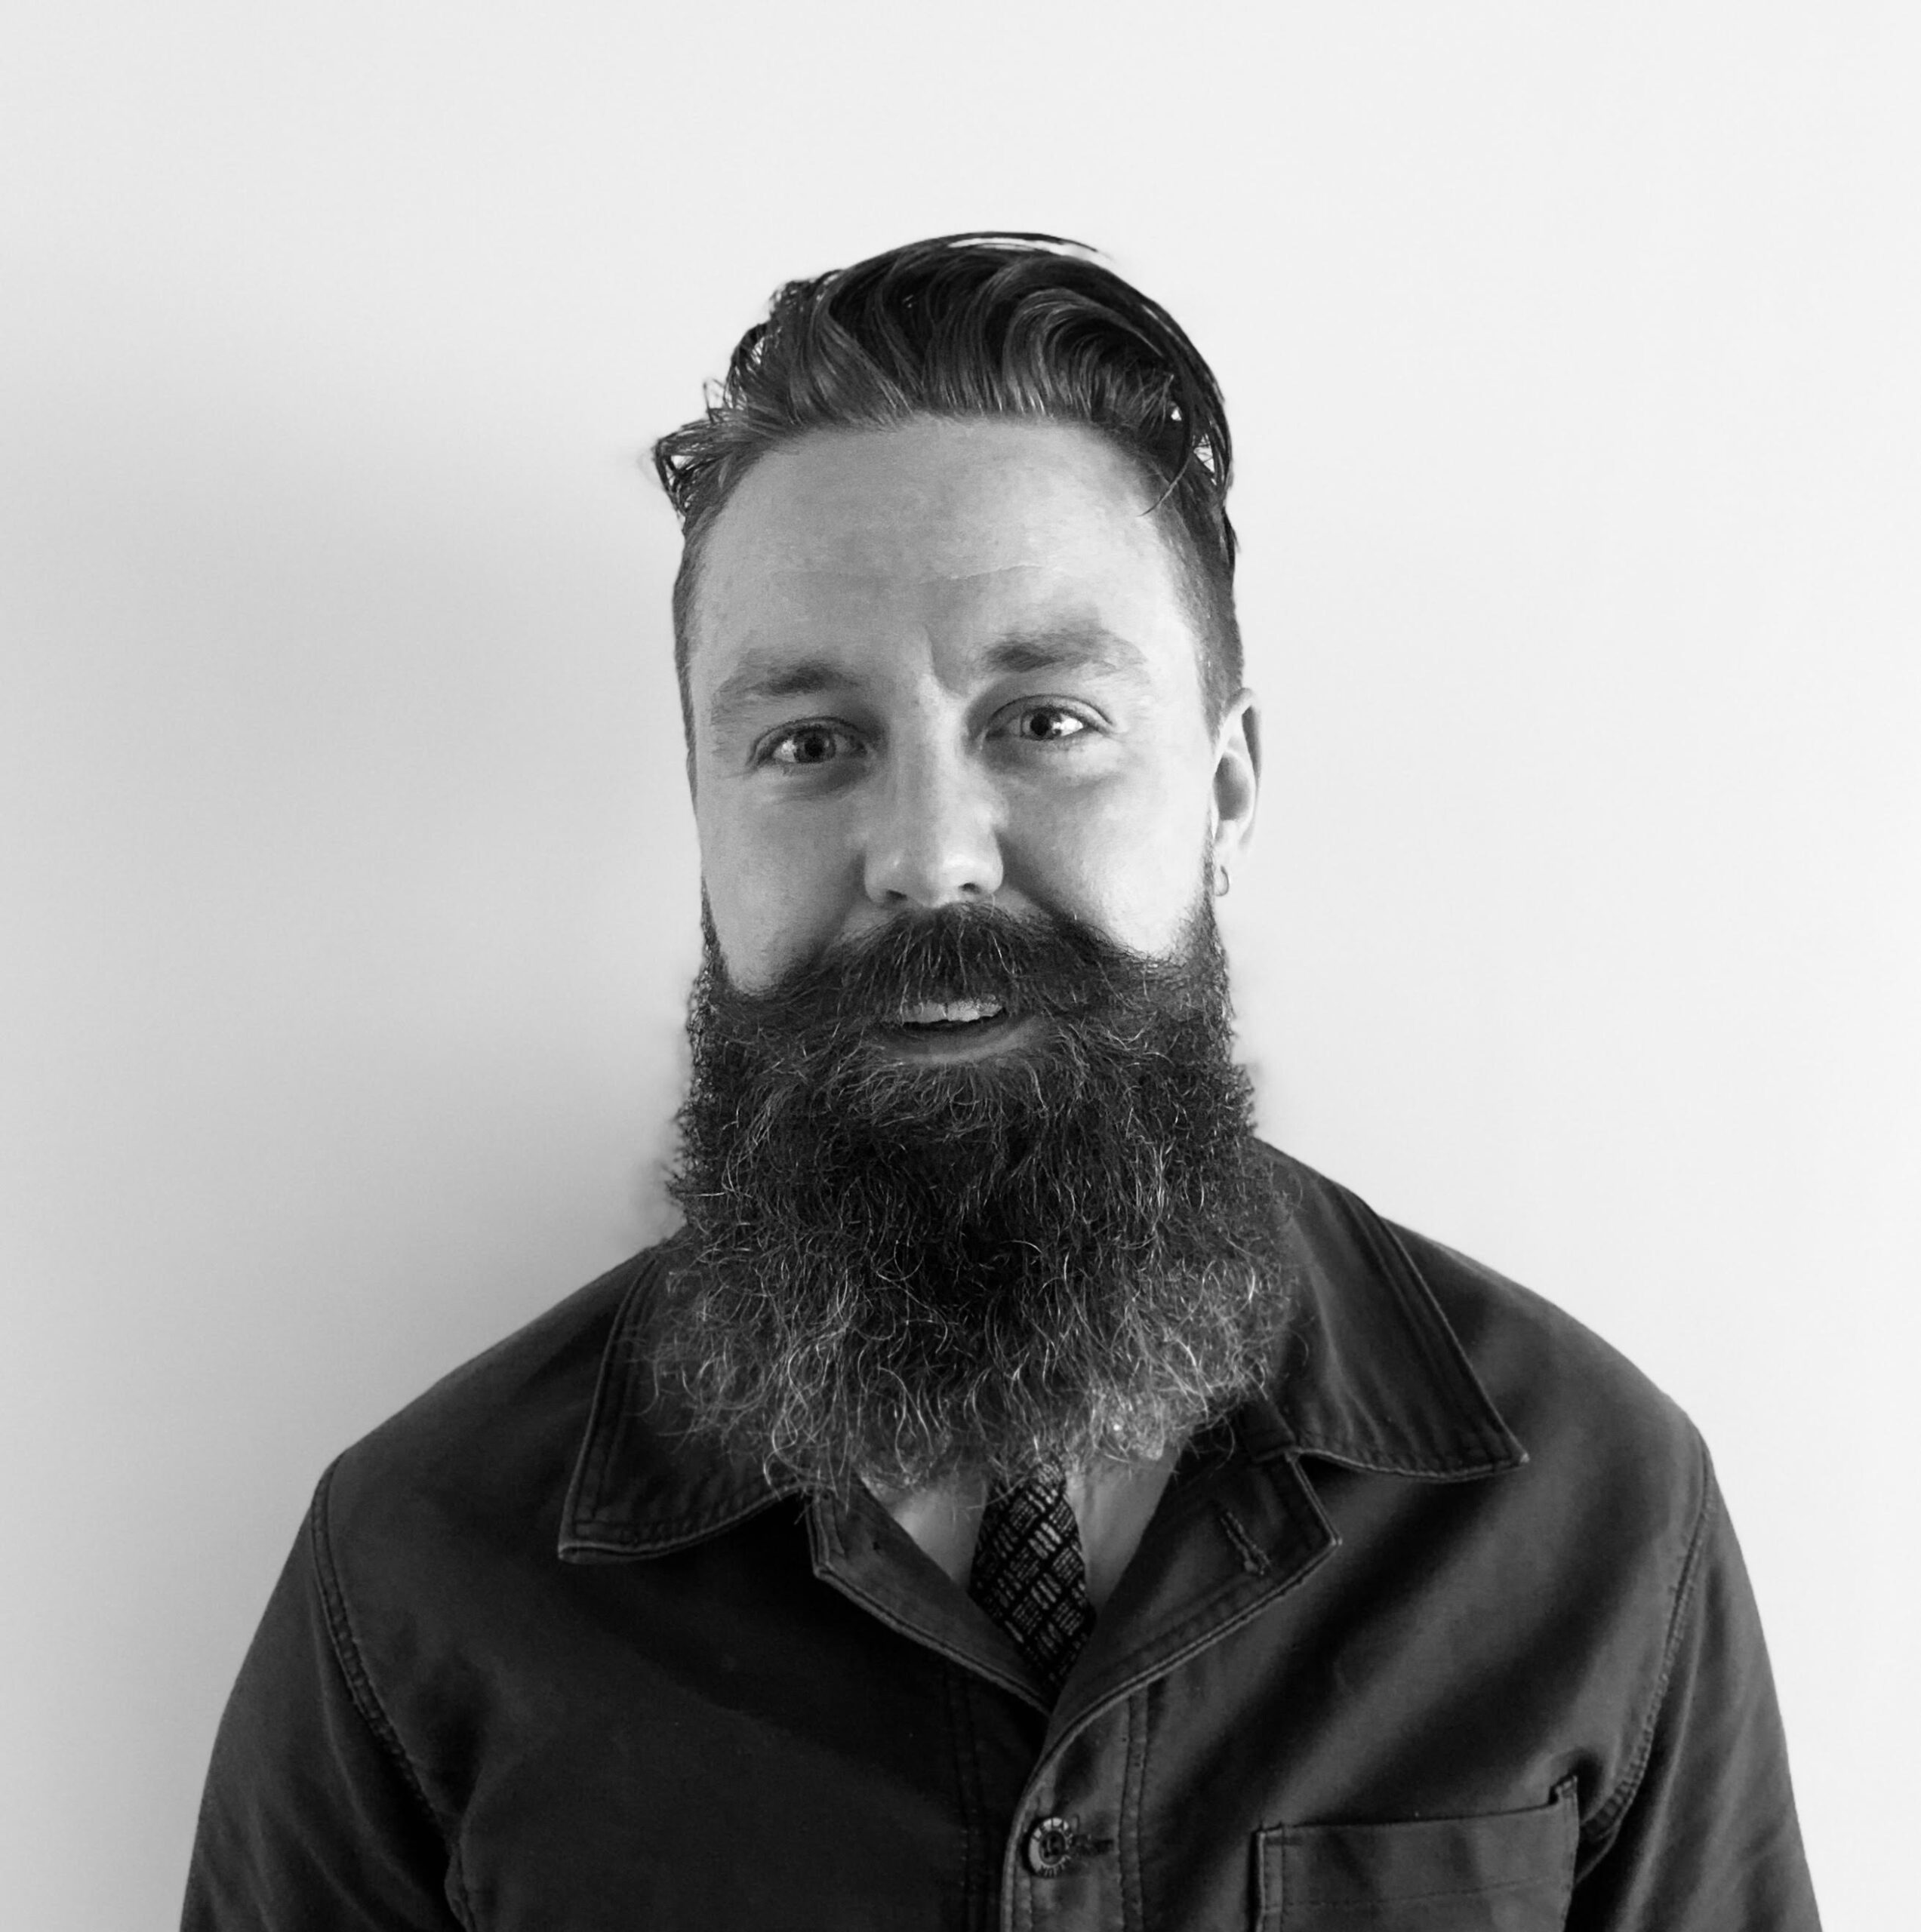 Simon Grønlund